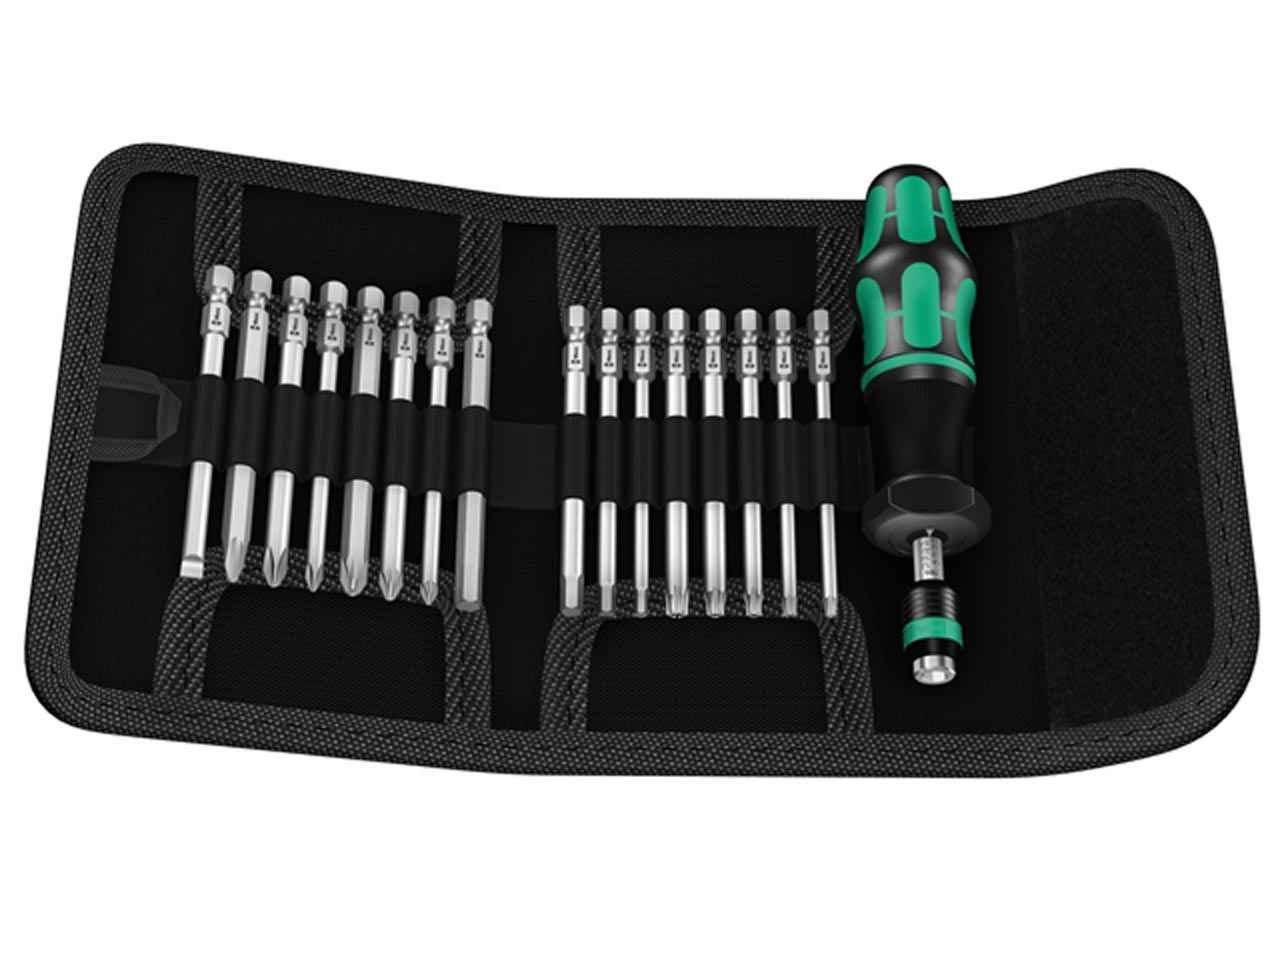 wera 05059293001 17 piece kompact 60 torque screwdriver set. Black Bedroom Furniture Sets. Home Design Ideas